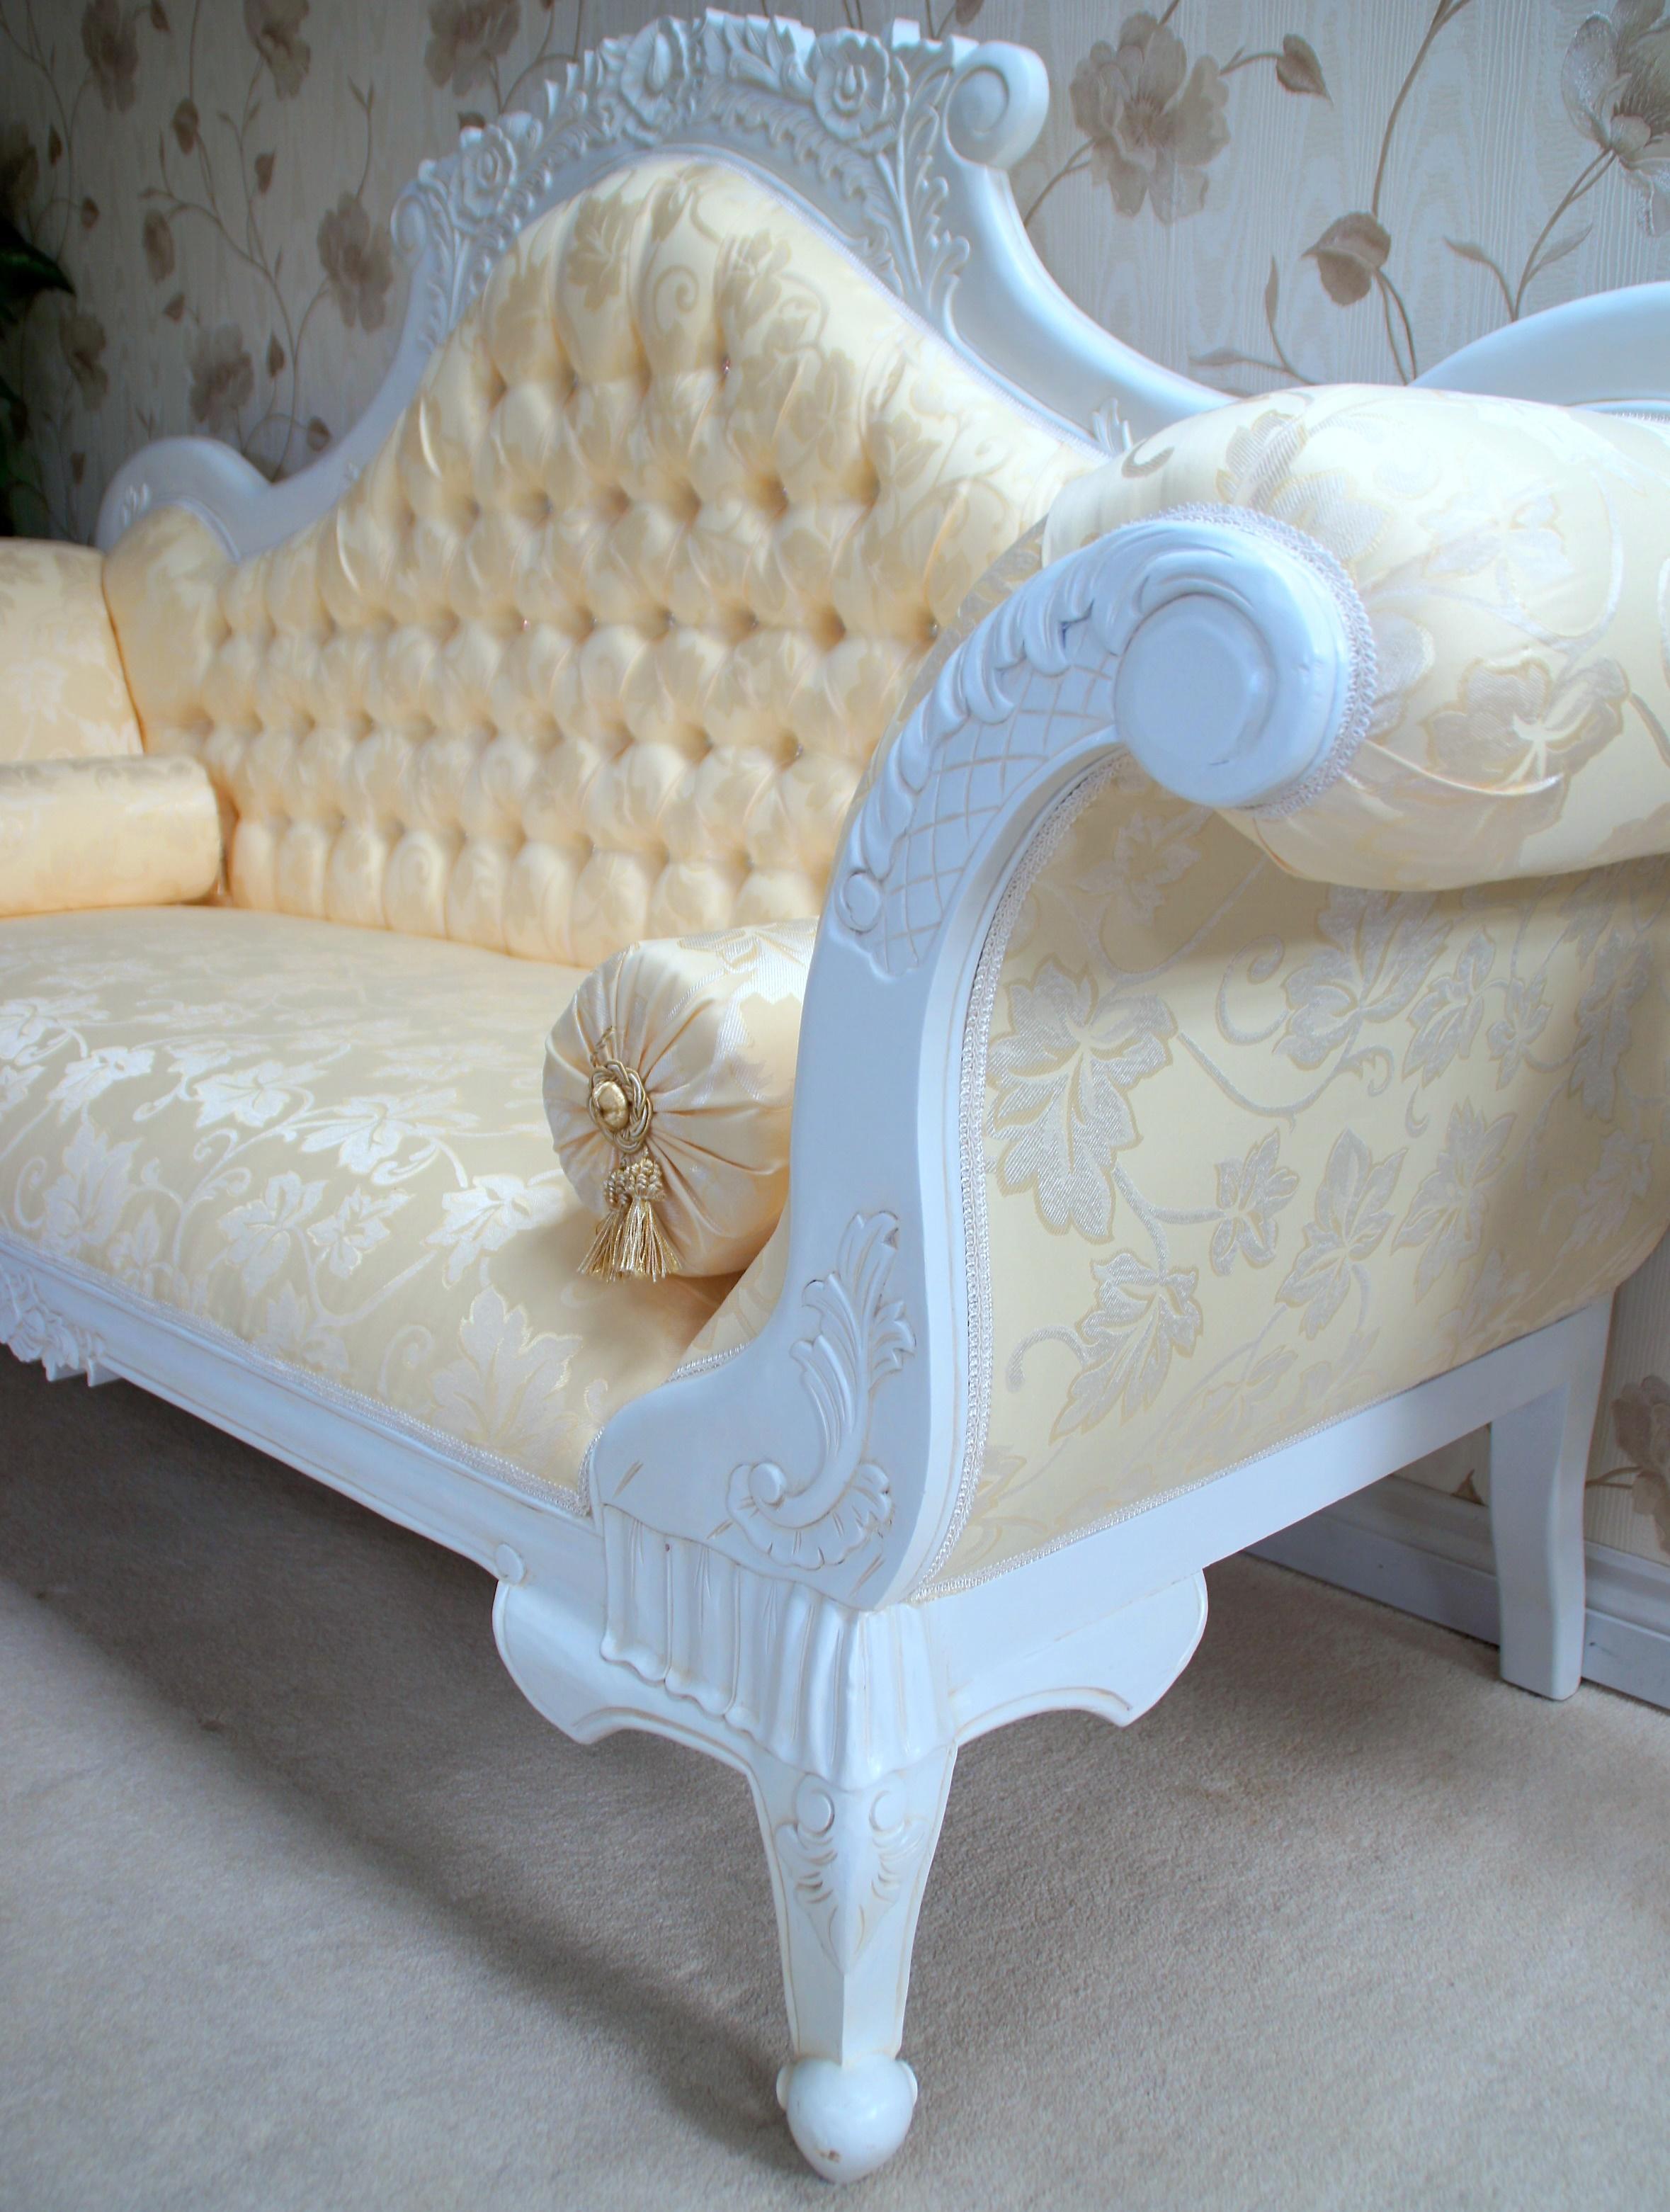 Antique White Ornate Wedding Sofa Now With Diamond Crystal